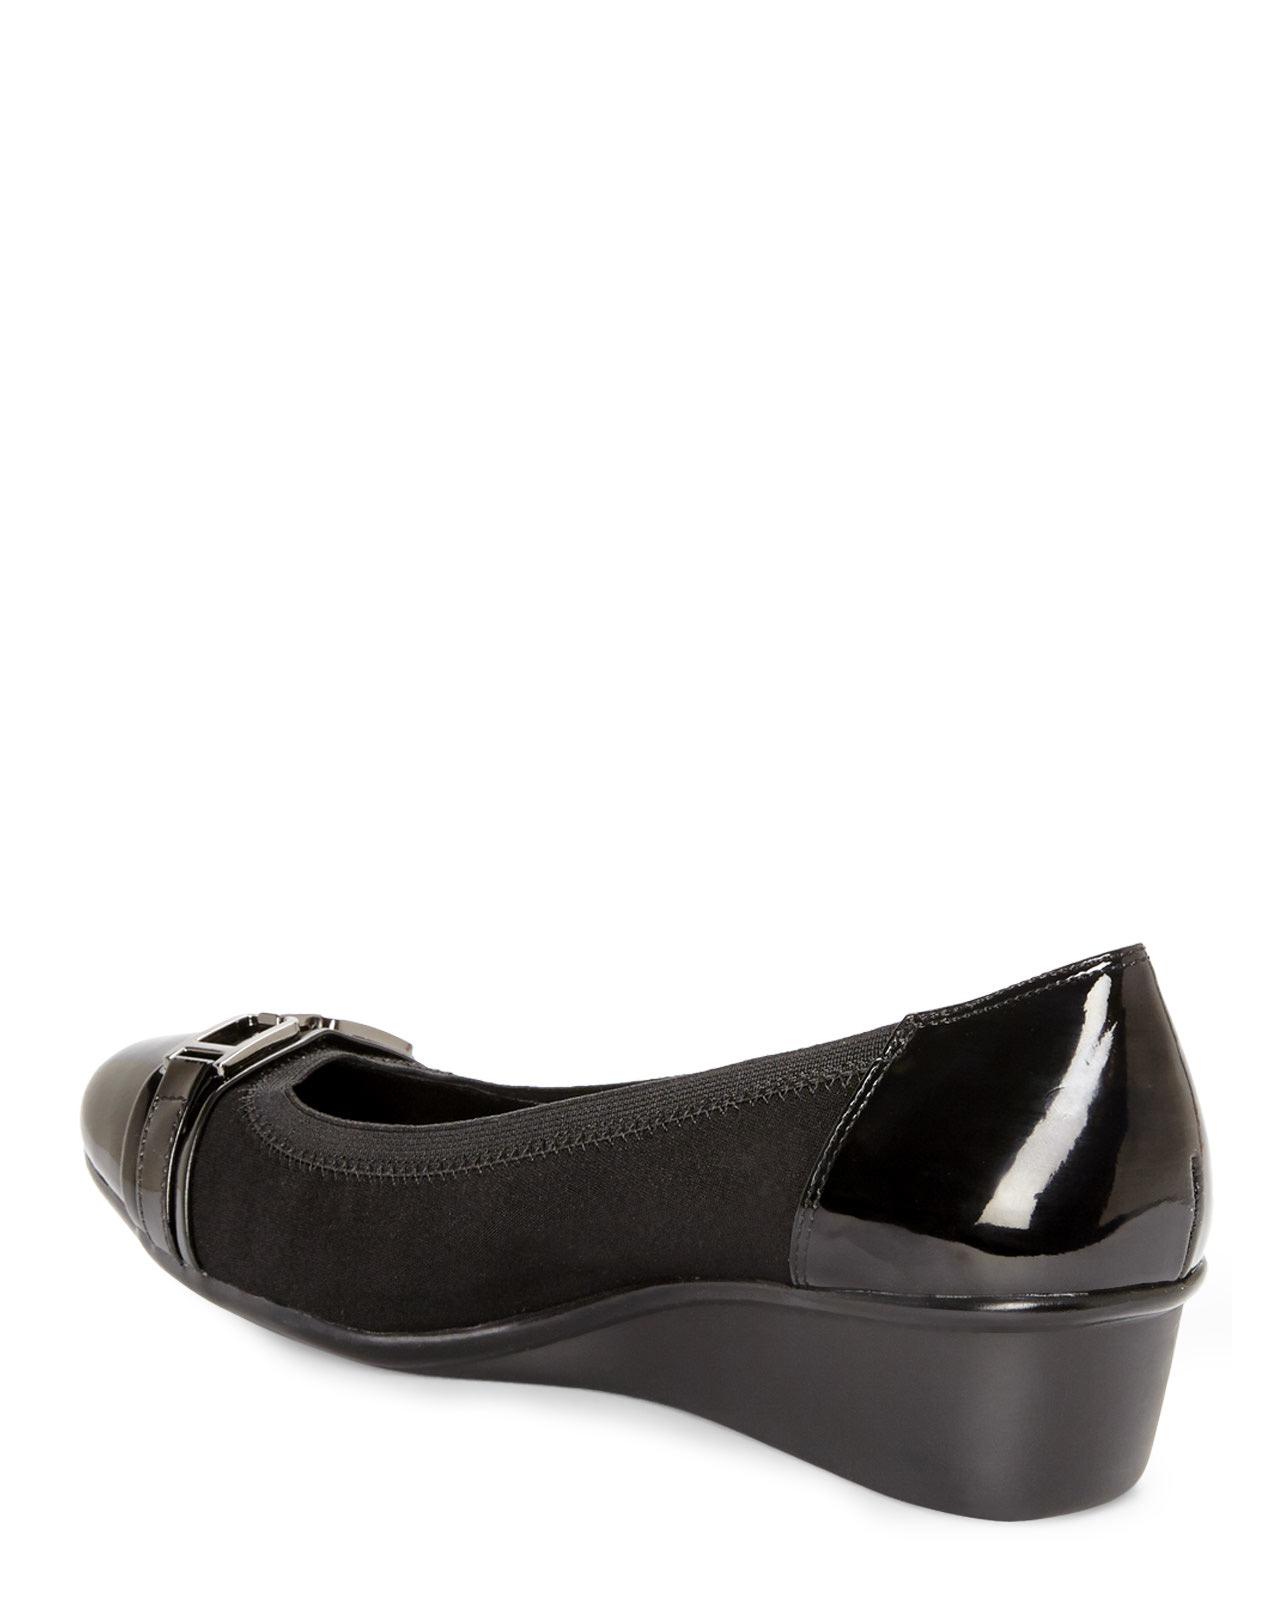 4476169a1d1 Lyst anne klein carly in black jpg 1280x1600 Anne klein sport wedge shoes